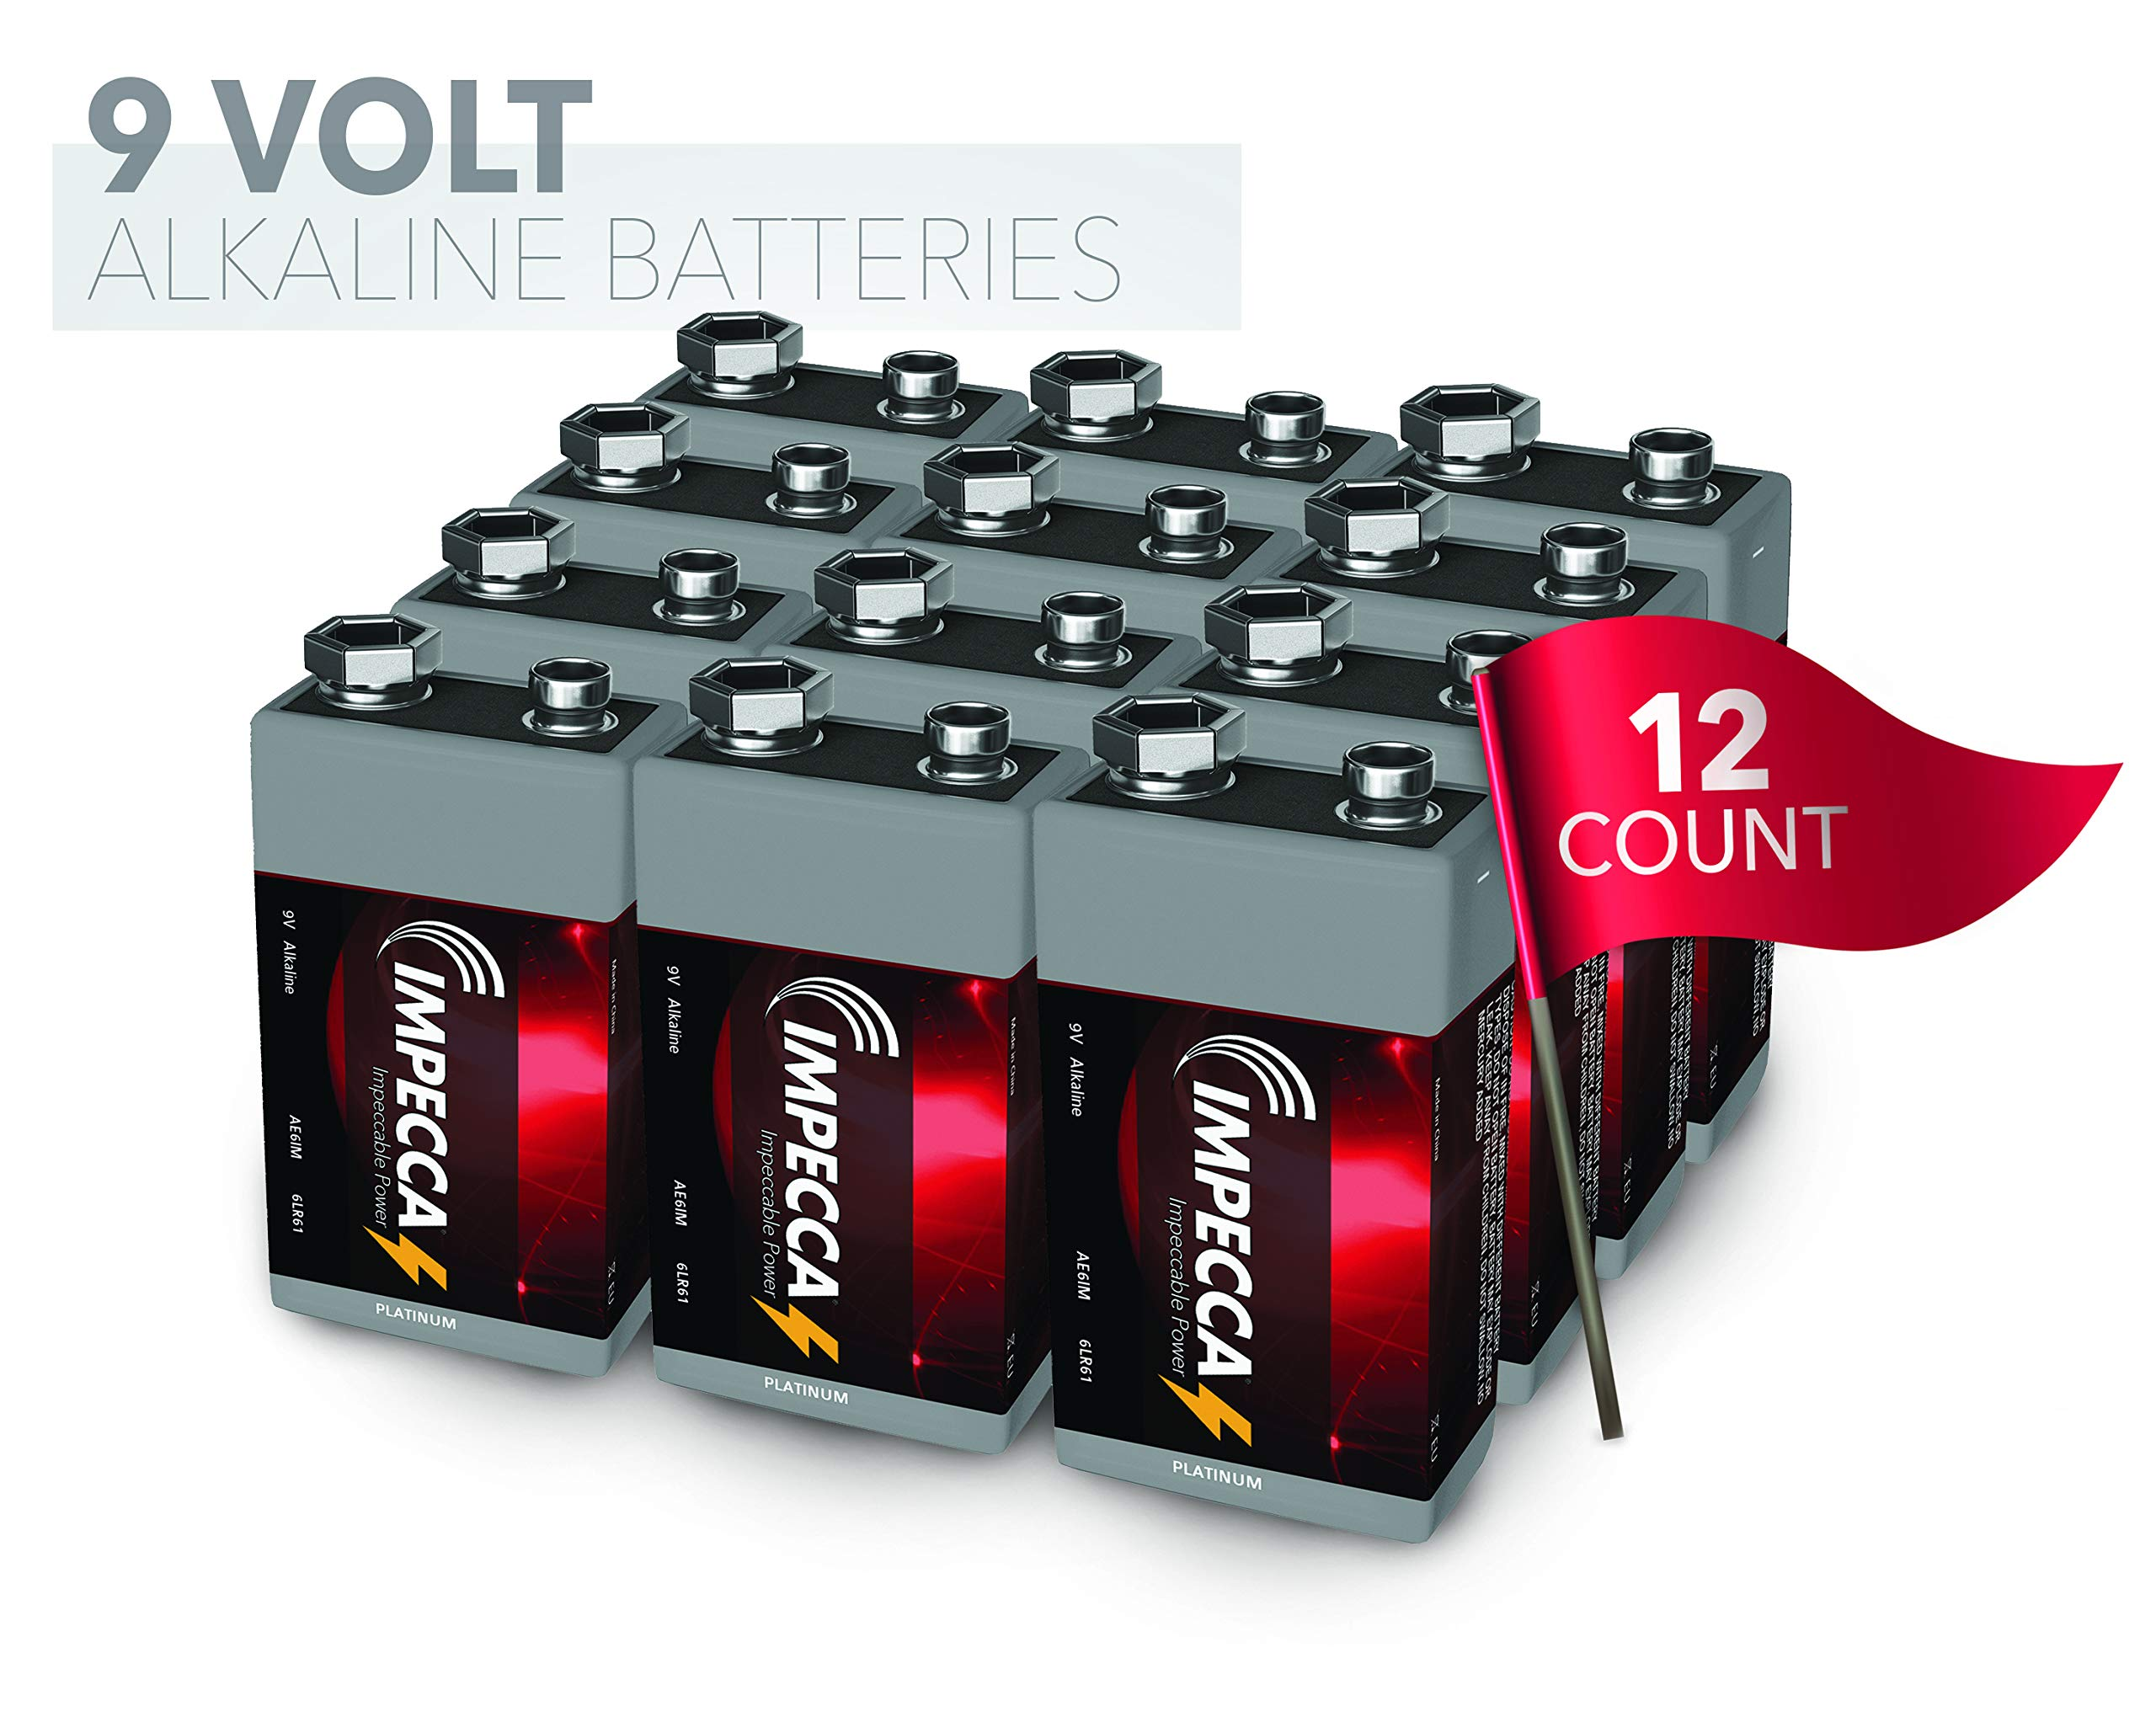 IMPECCA 9-Volt Batteries, (12 Pack) Everyday Alkaline Battery, High Performance, Long Lasting, and Leak Resistant 9V Battery, 12 Count 6LR61 - Platinum Series